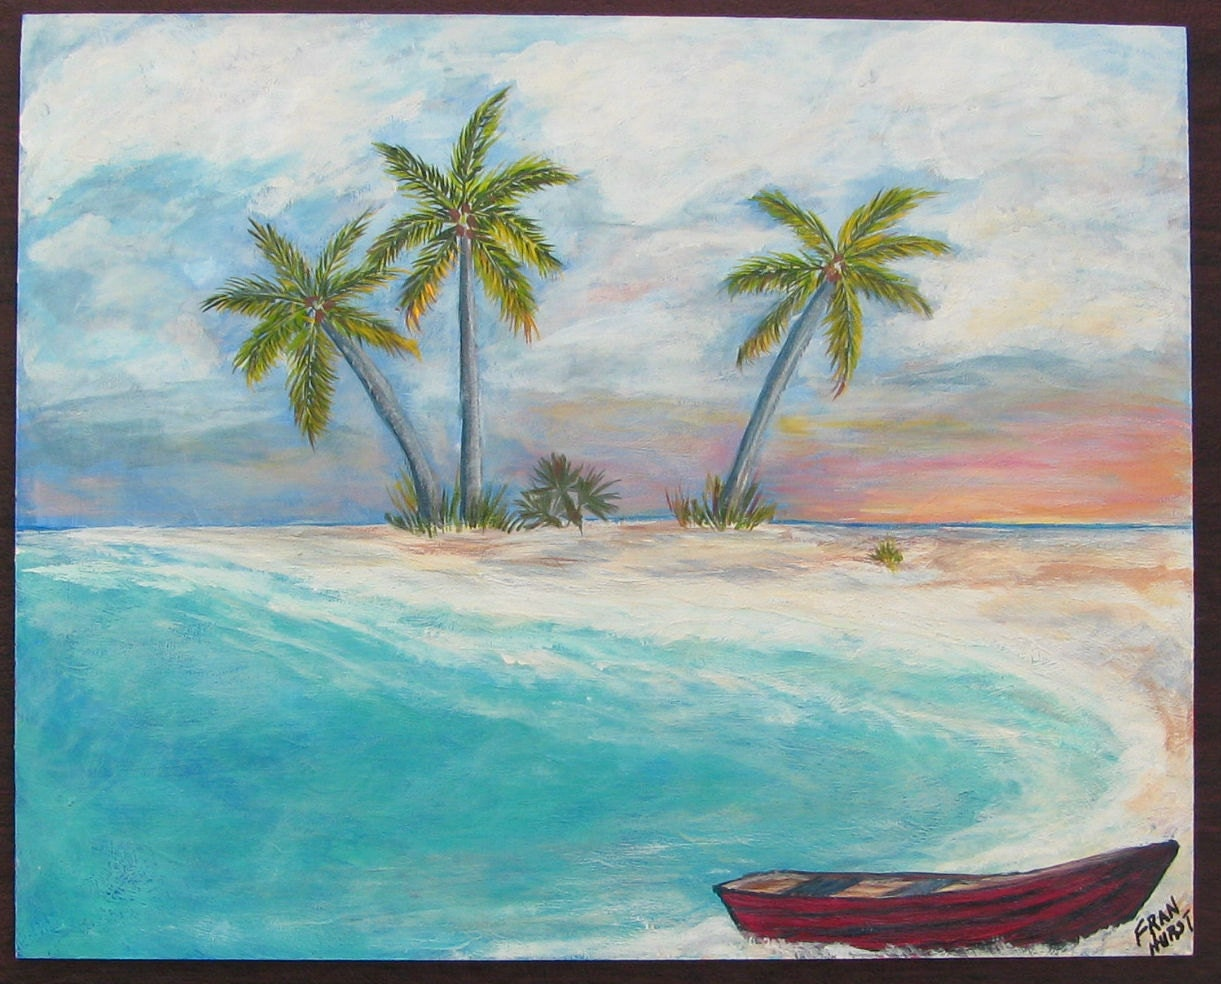 Tropical Island Beach Original Acrylic Painting Coastal Art